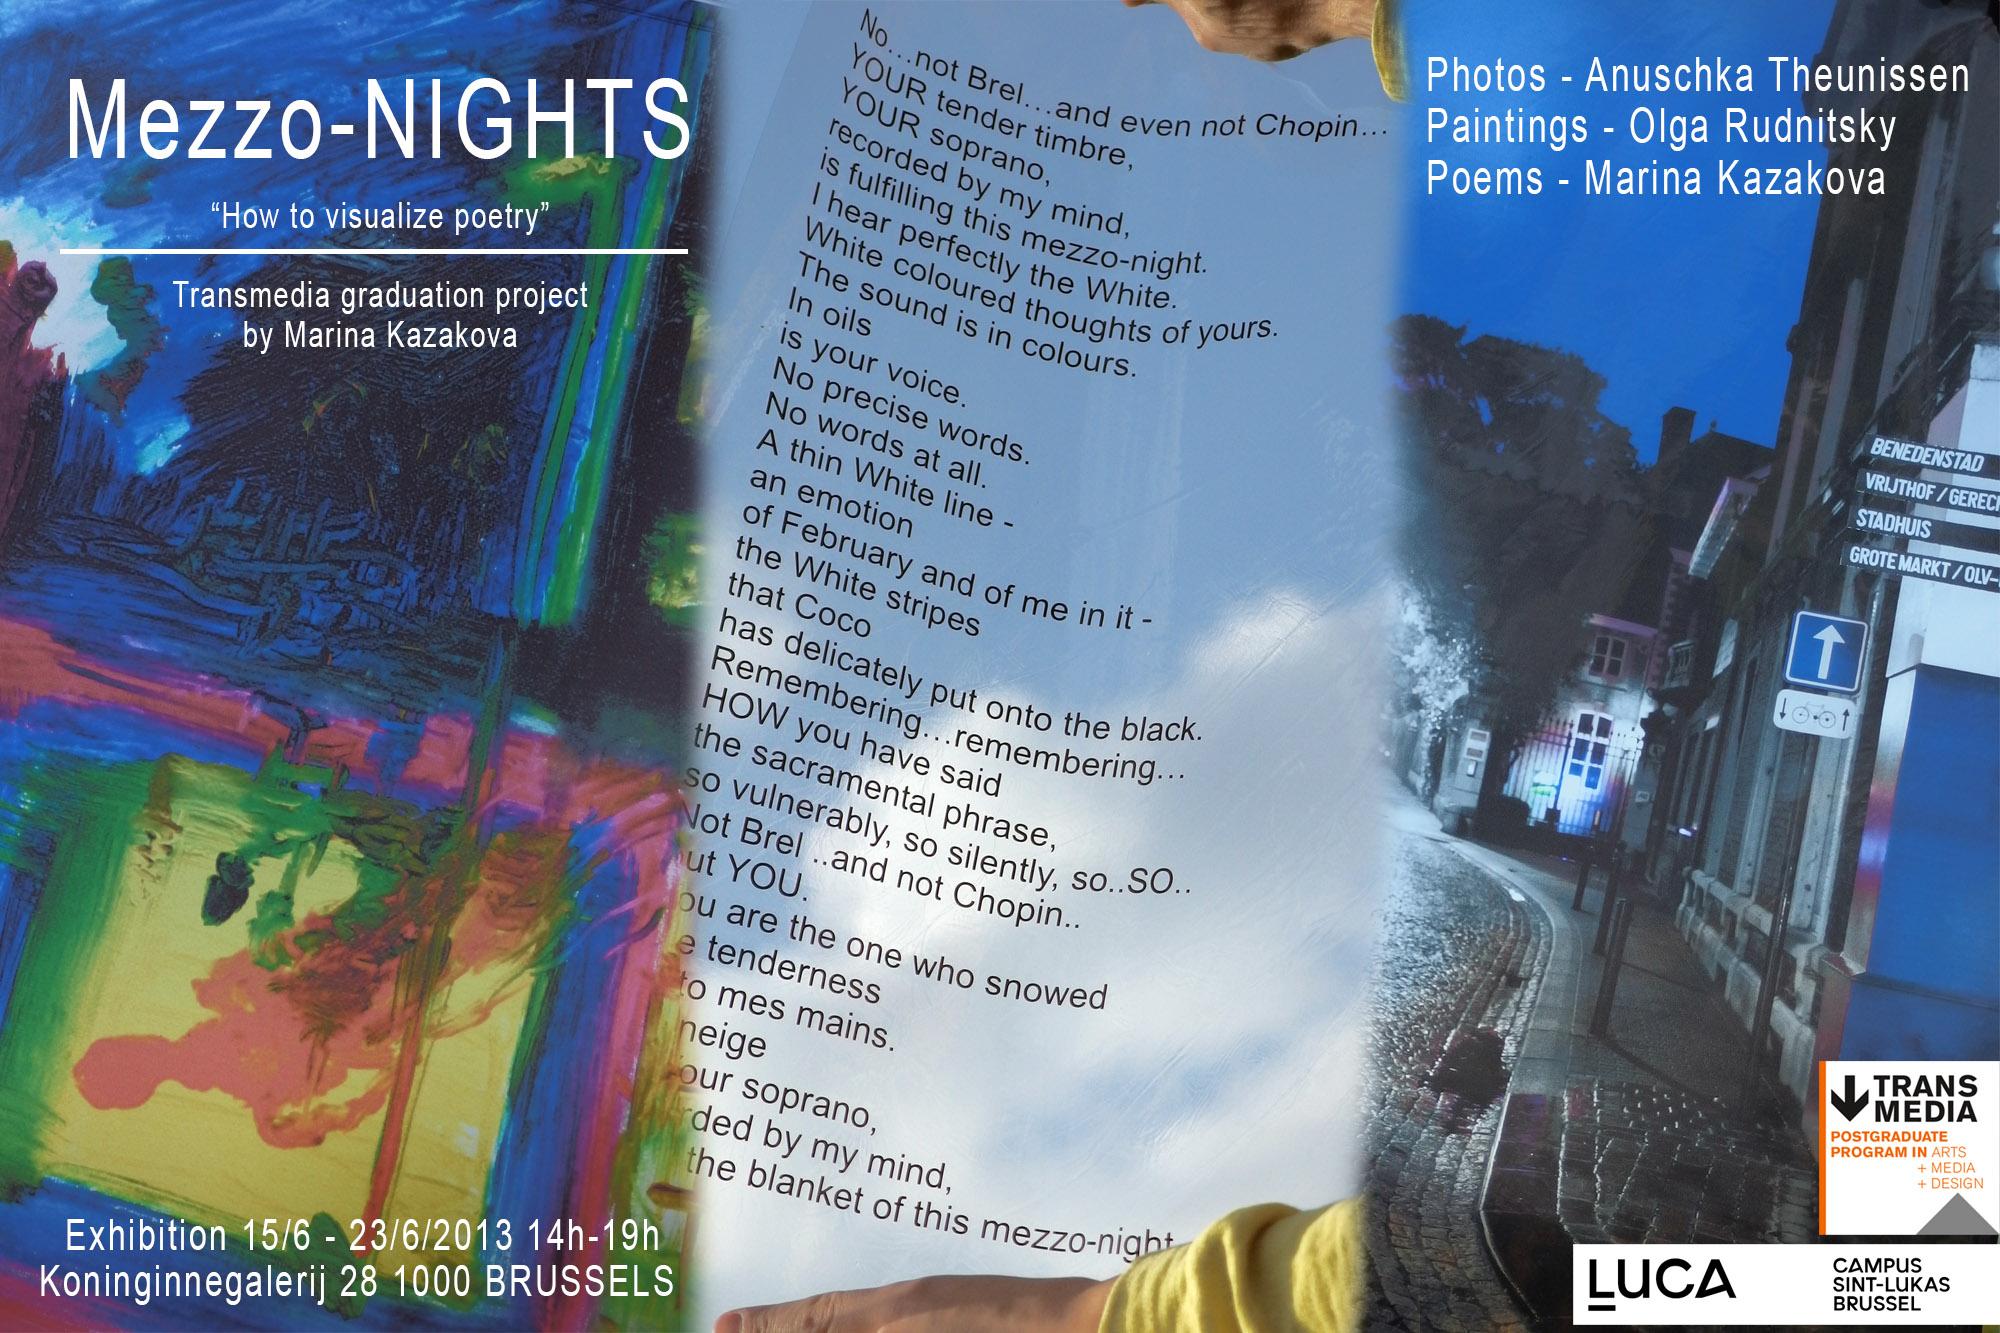 "Mixed-media poetry exhibition ""Mezzo-Nights"", Brussels, Belgium"